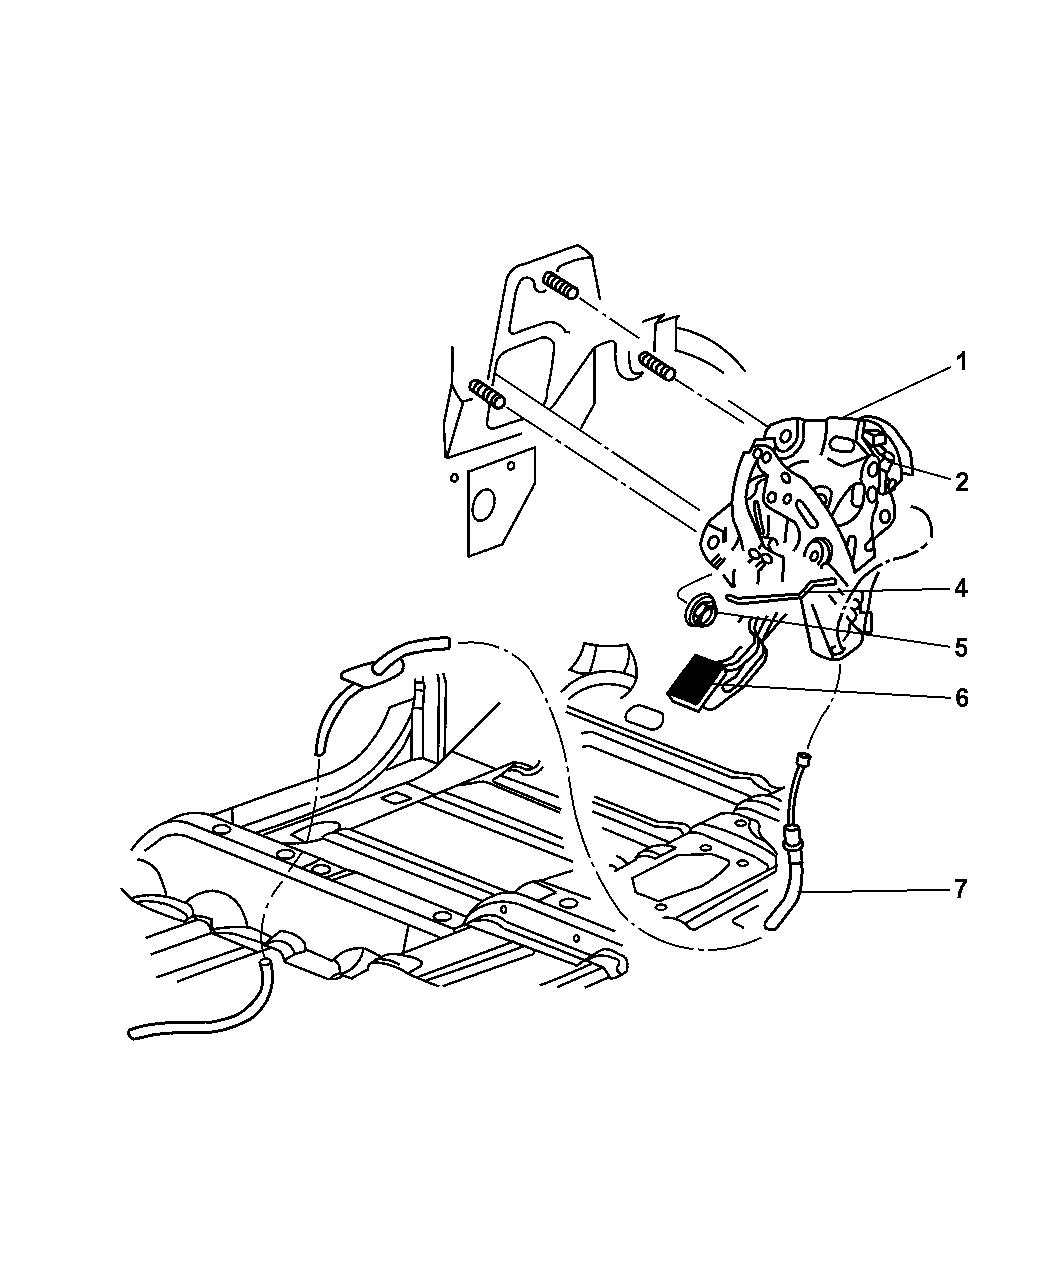 2003 Dodge Ram 1500 Parking Brake Lever & Front Cable